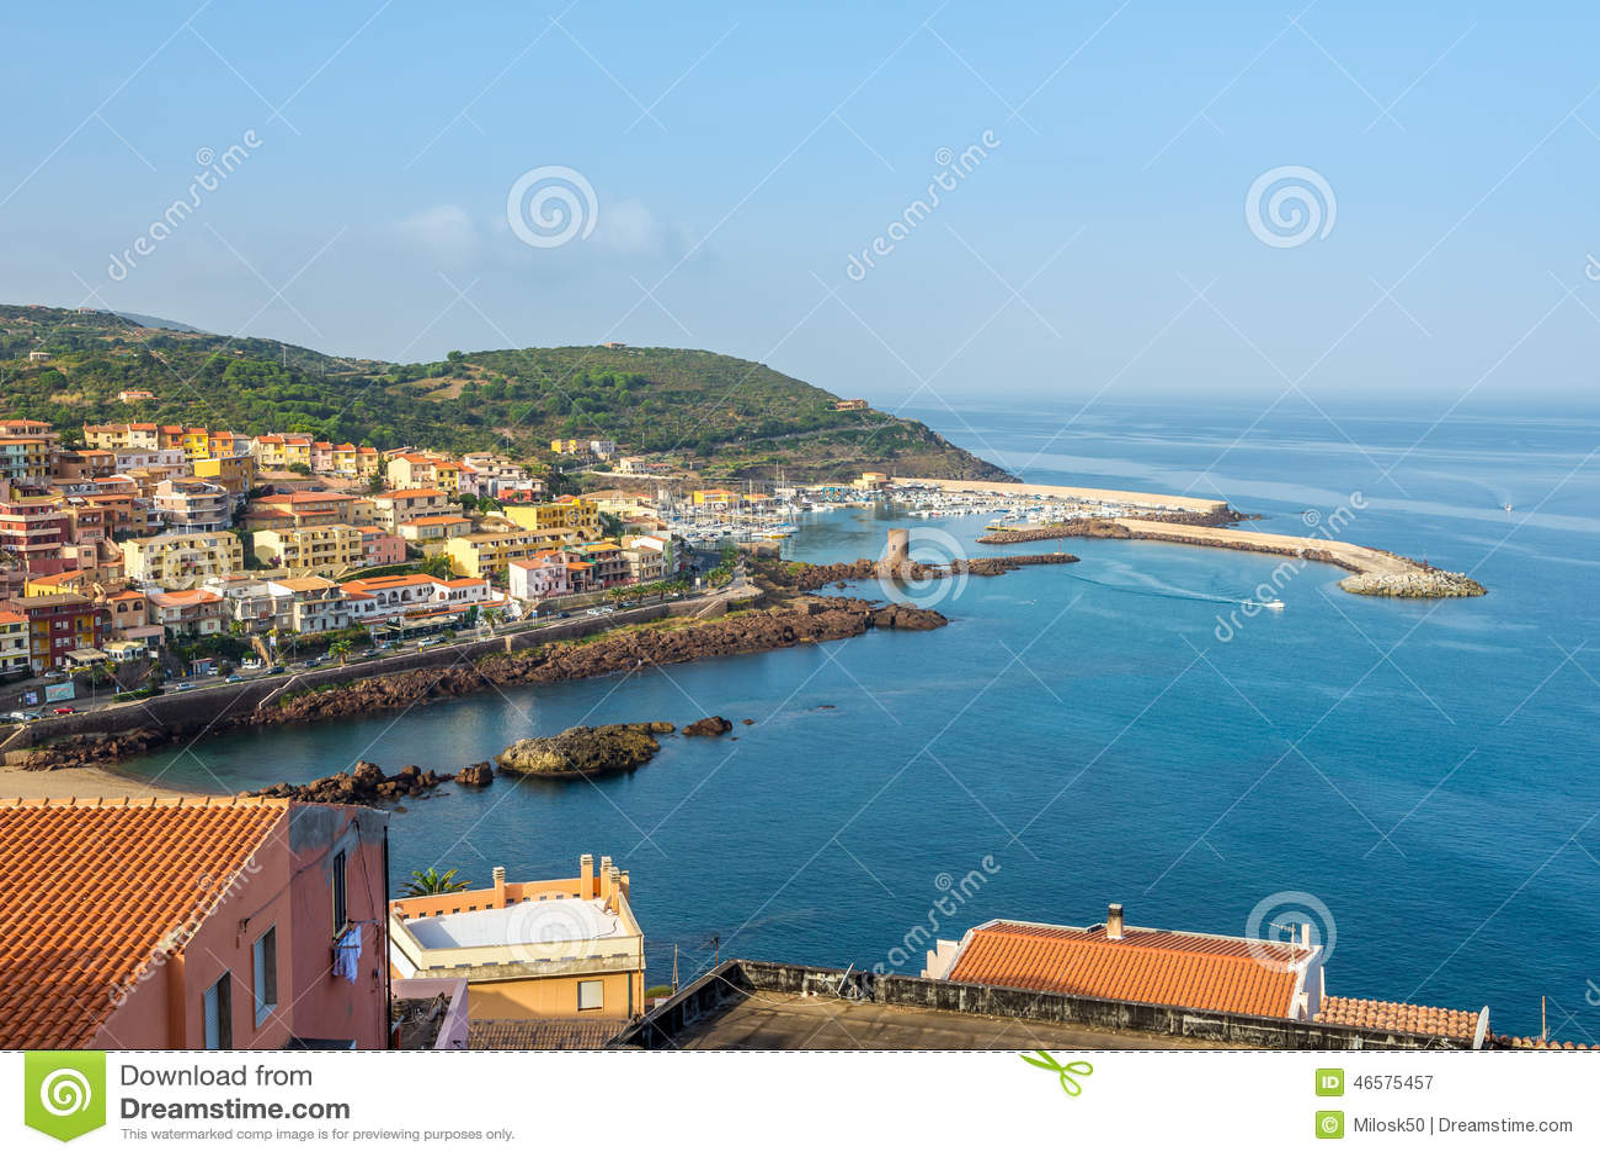 Castelsardo Italy  City pictures : CASTELSARDO,ITALY SEPTEMBER 21,2014 View at the Castelsardo port ...